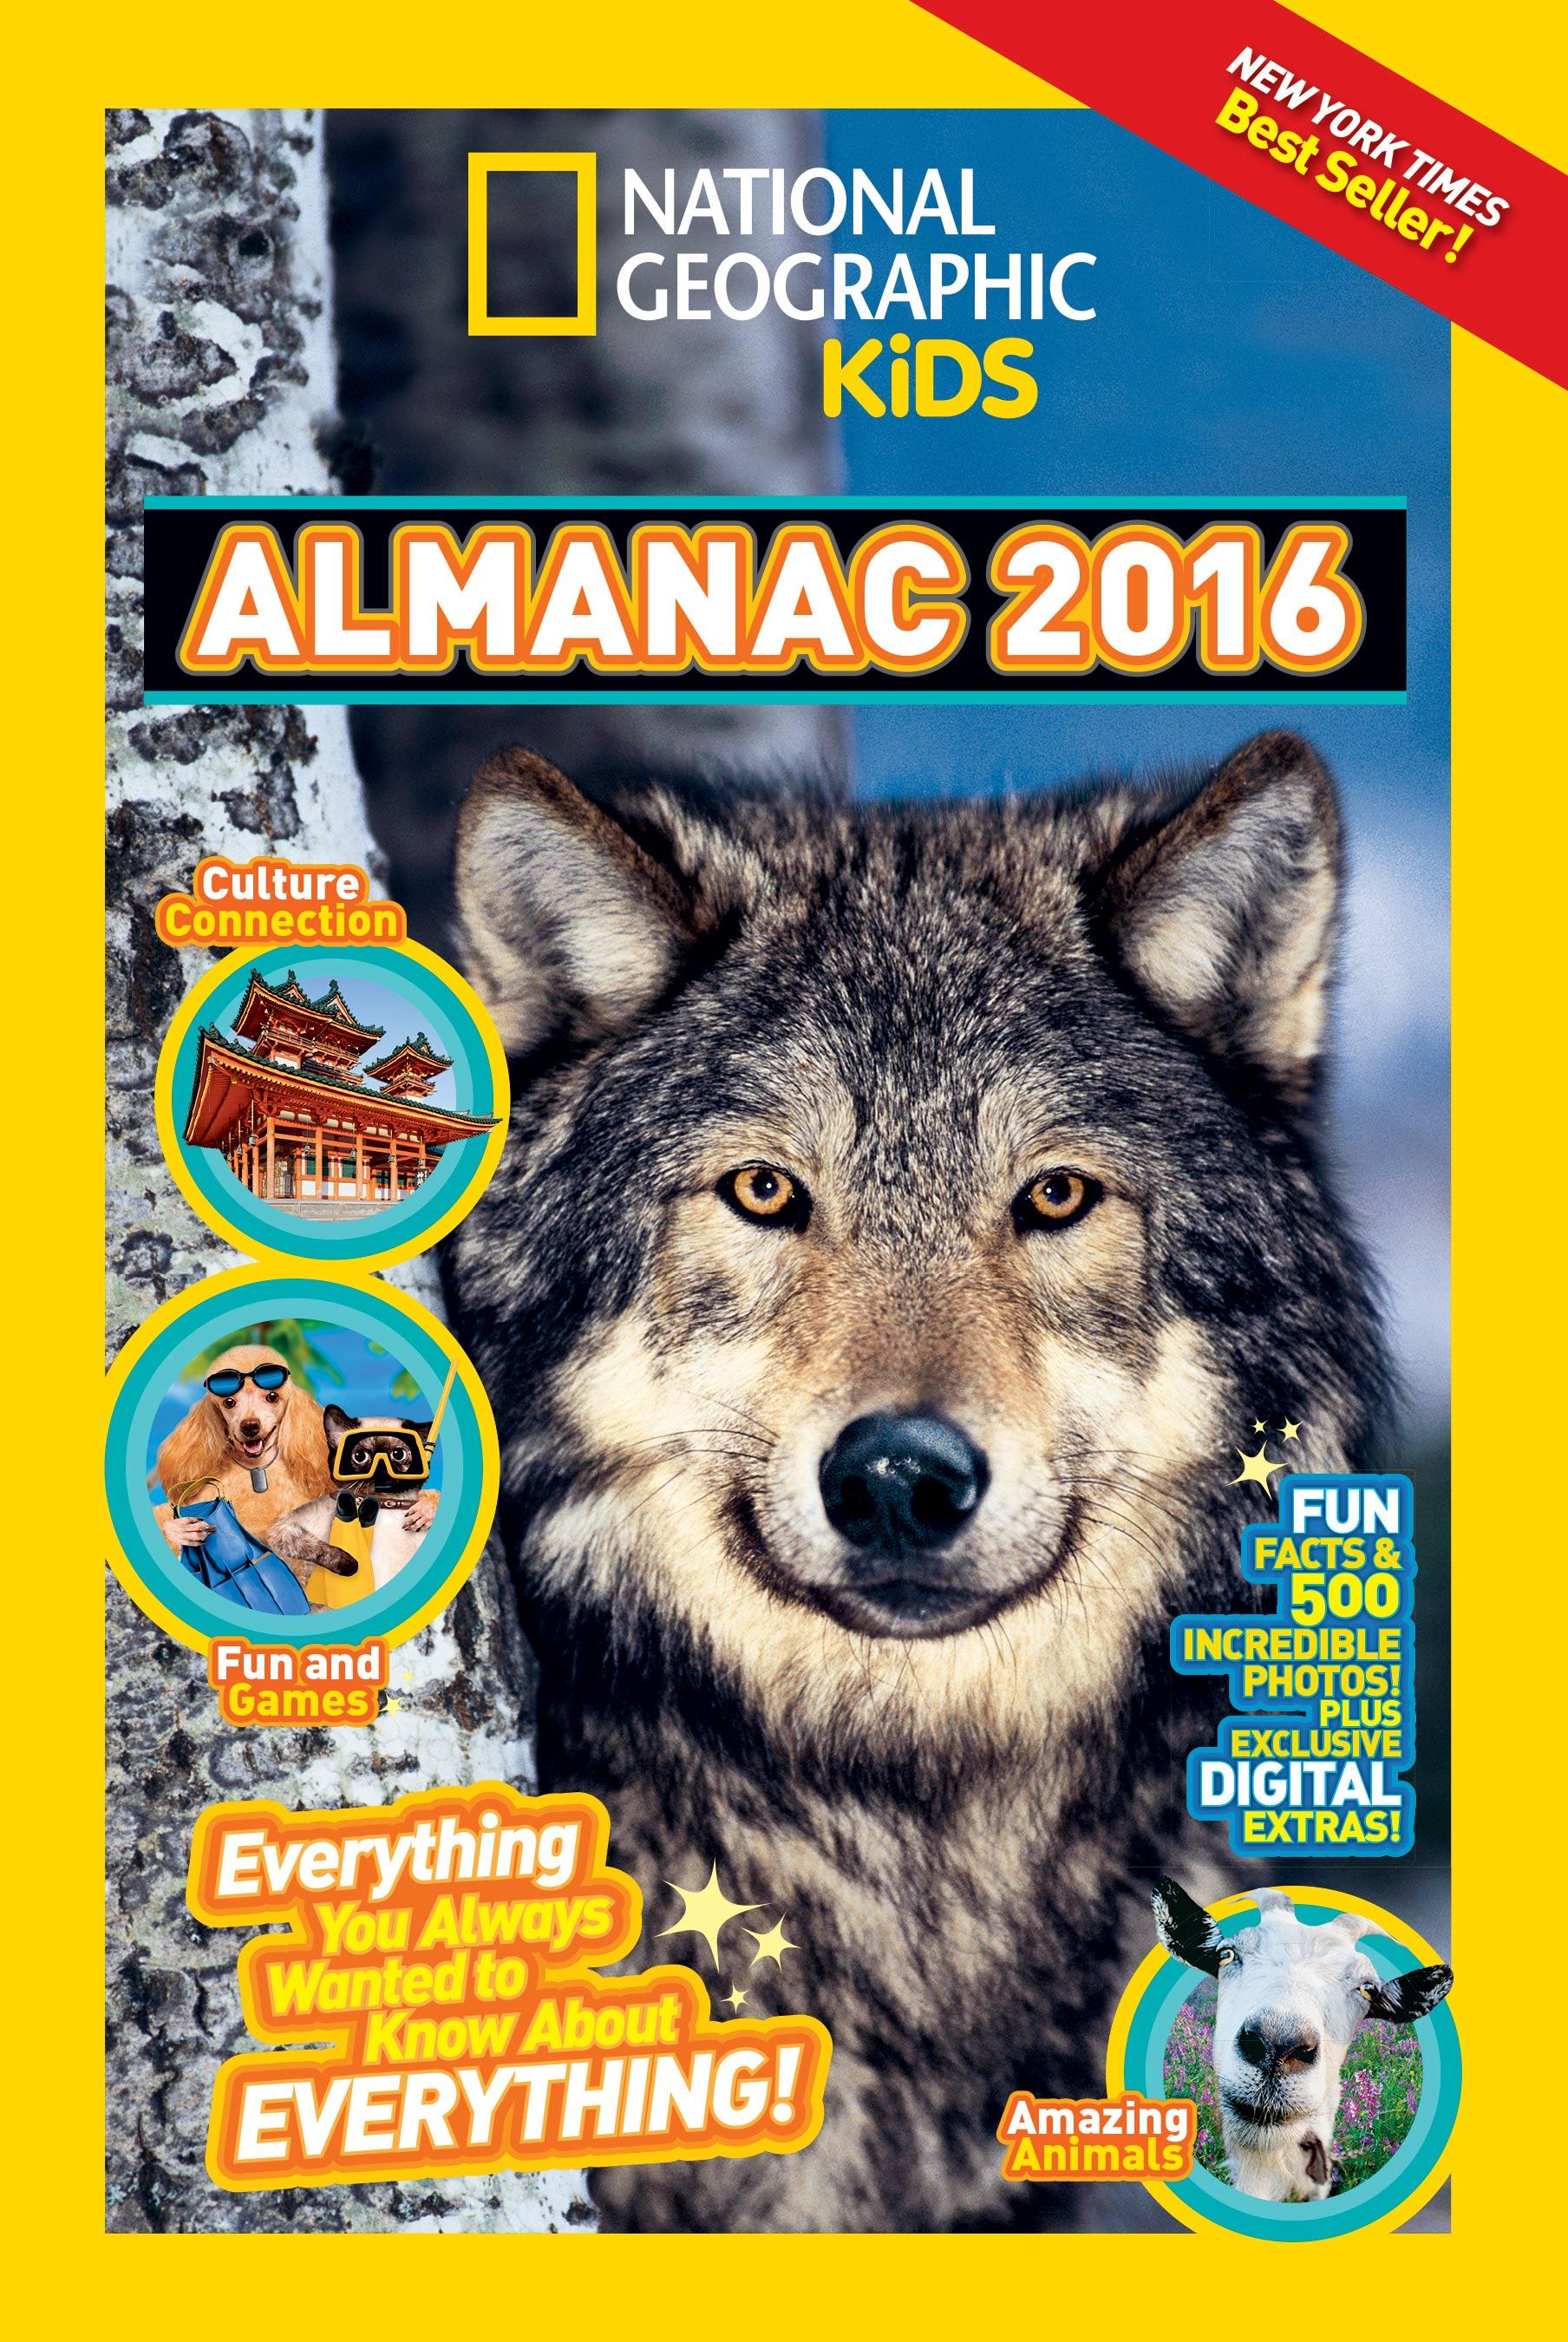 Almanac 2016.